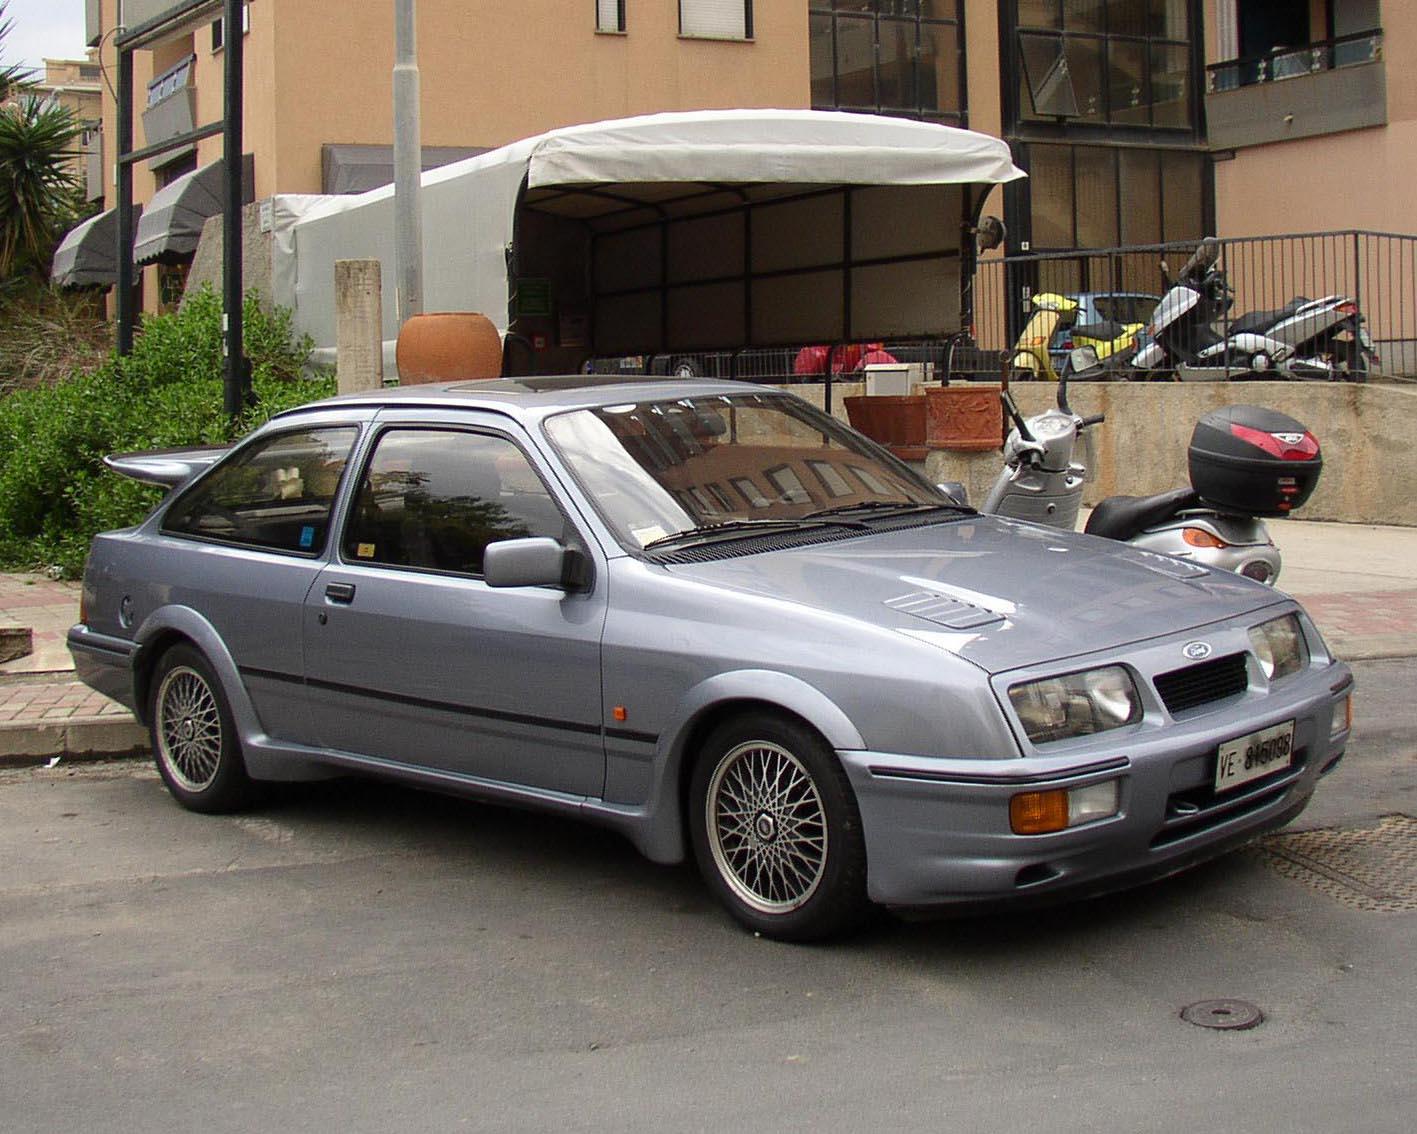 i like angular cars - Page 2 - NorCal Rotary and Roadsters